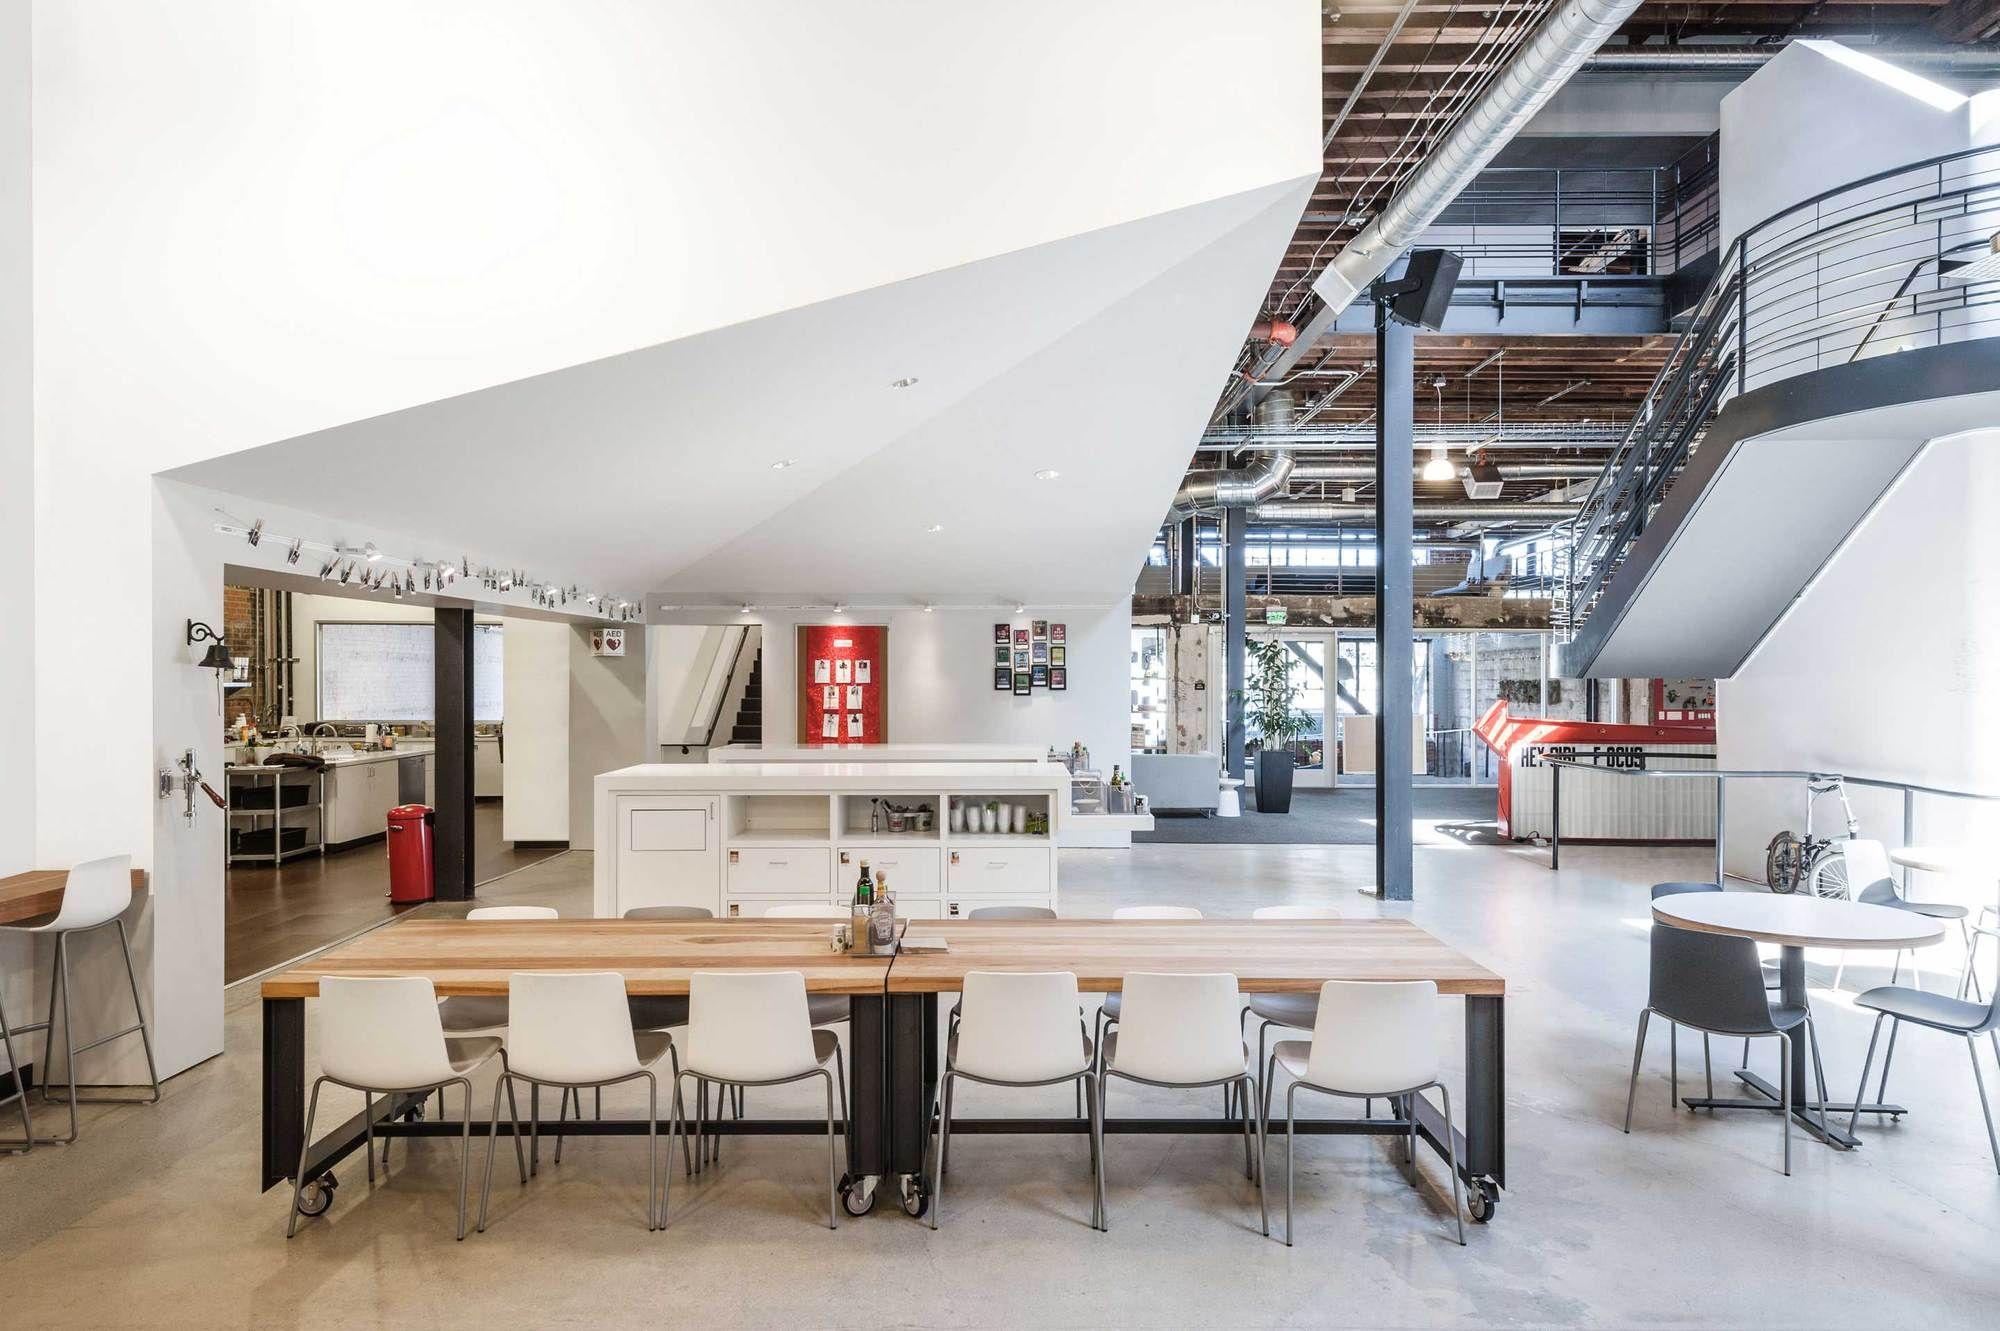 google office headquarters. Interior Of Pinterest Office Headquarters - Google Search